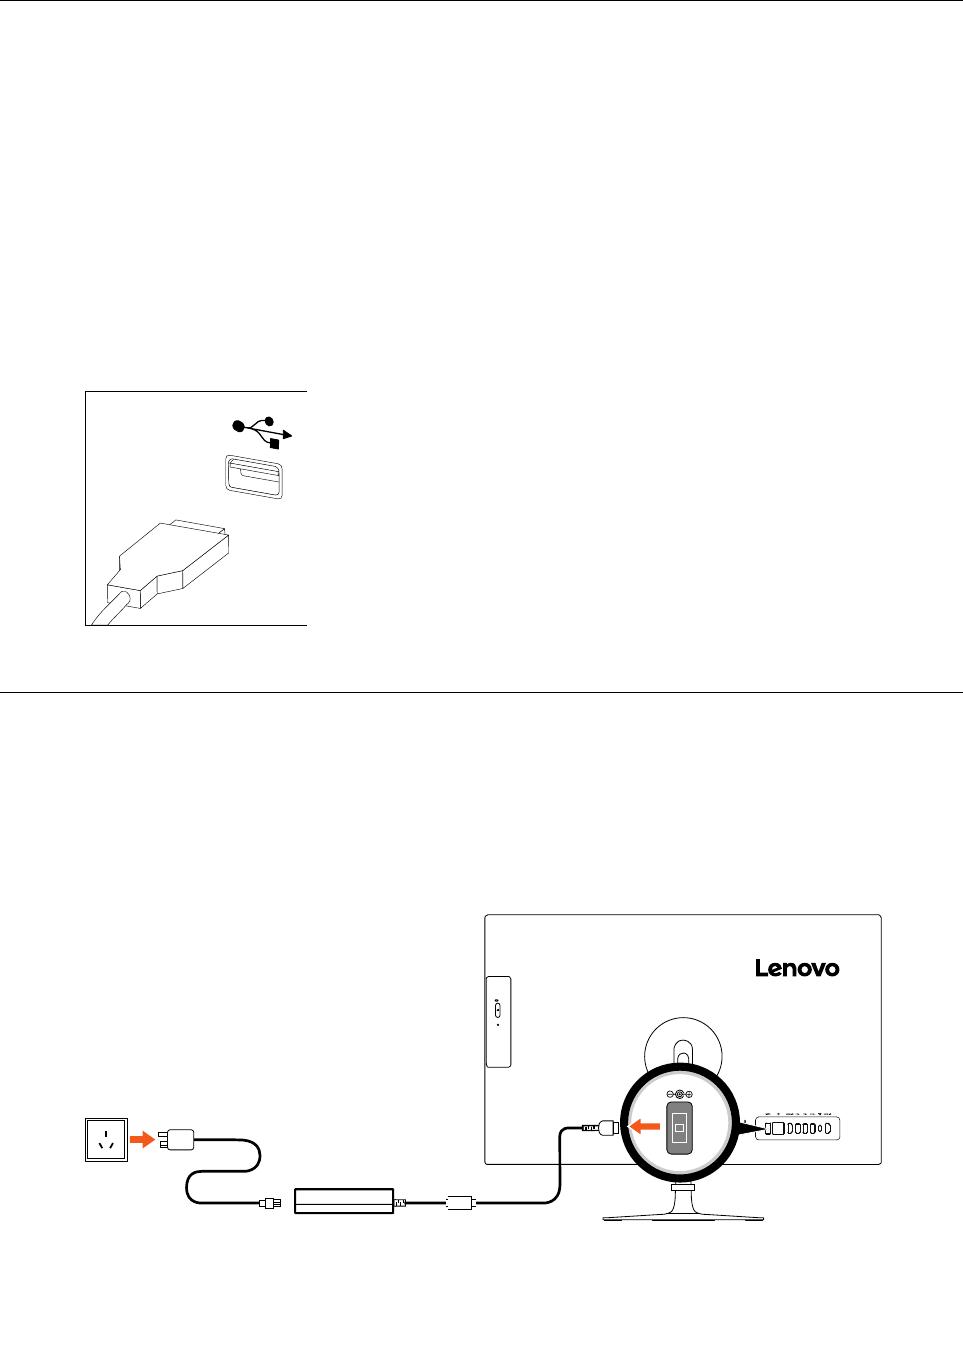 Lenovo Ideacentre 520 22 24 Hmm 20170804 User Manual All